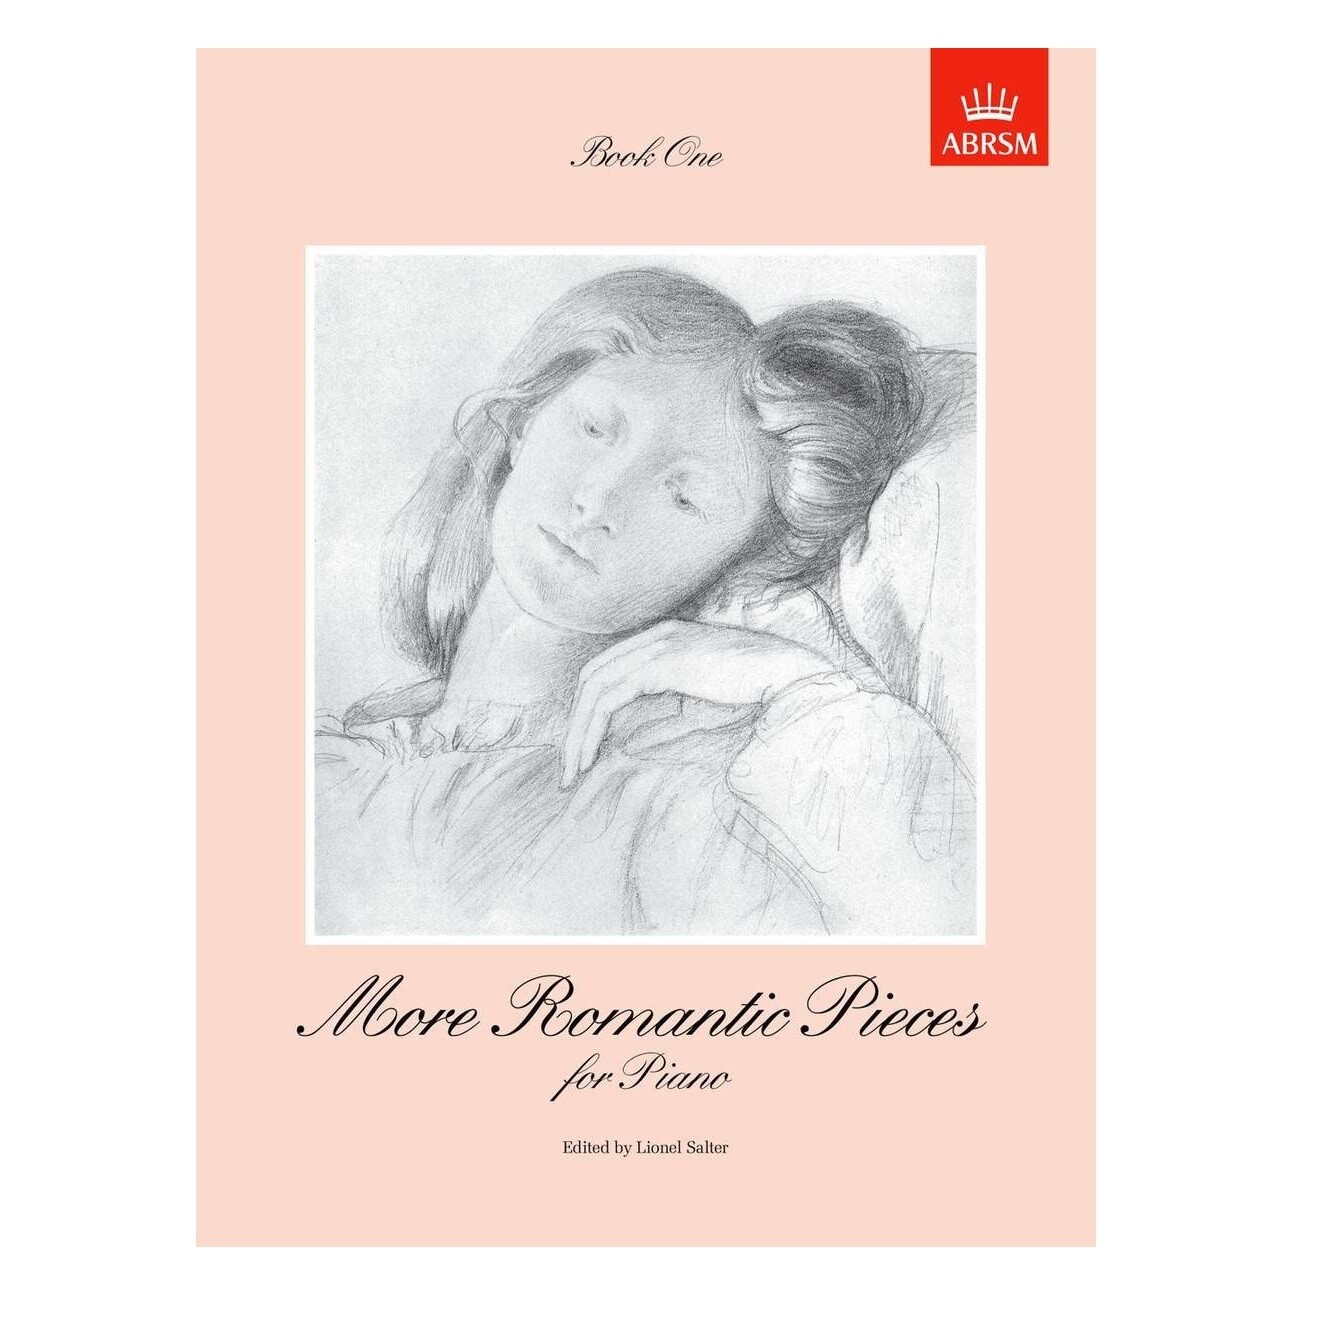 More Romantic Pieces for Piano, Book I